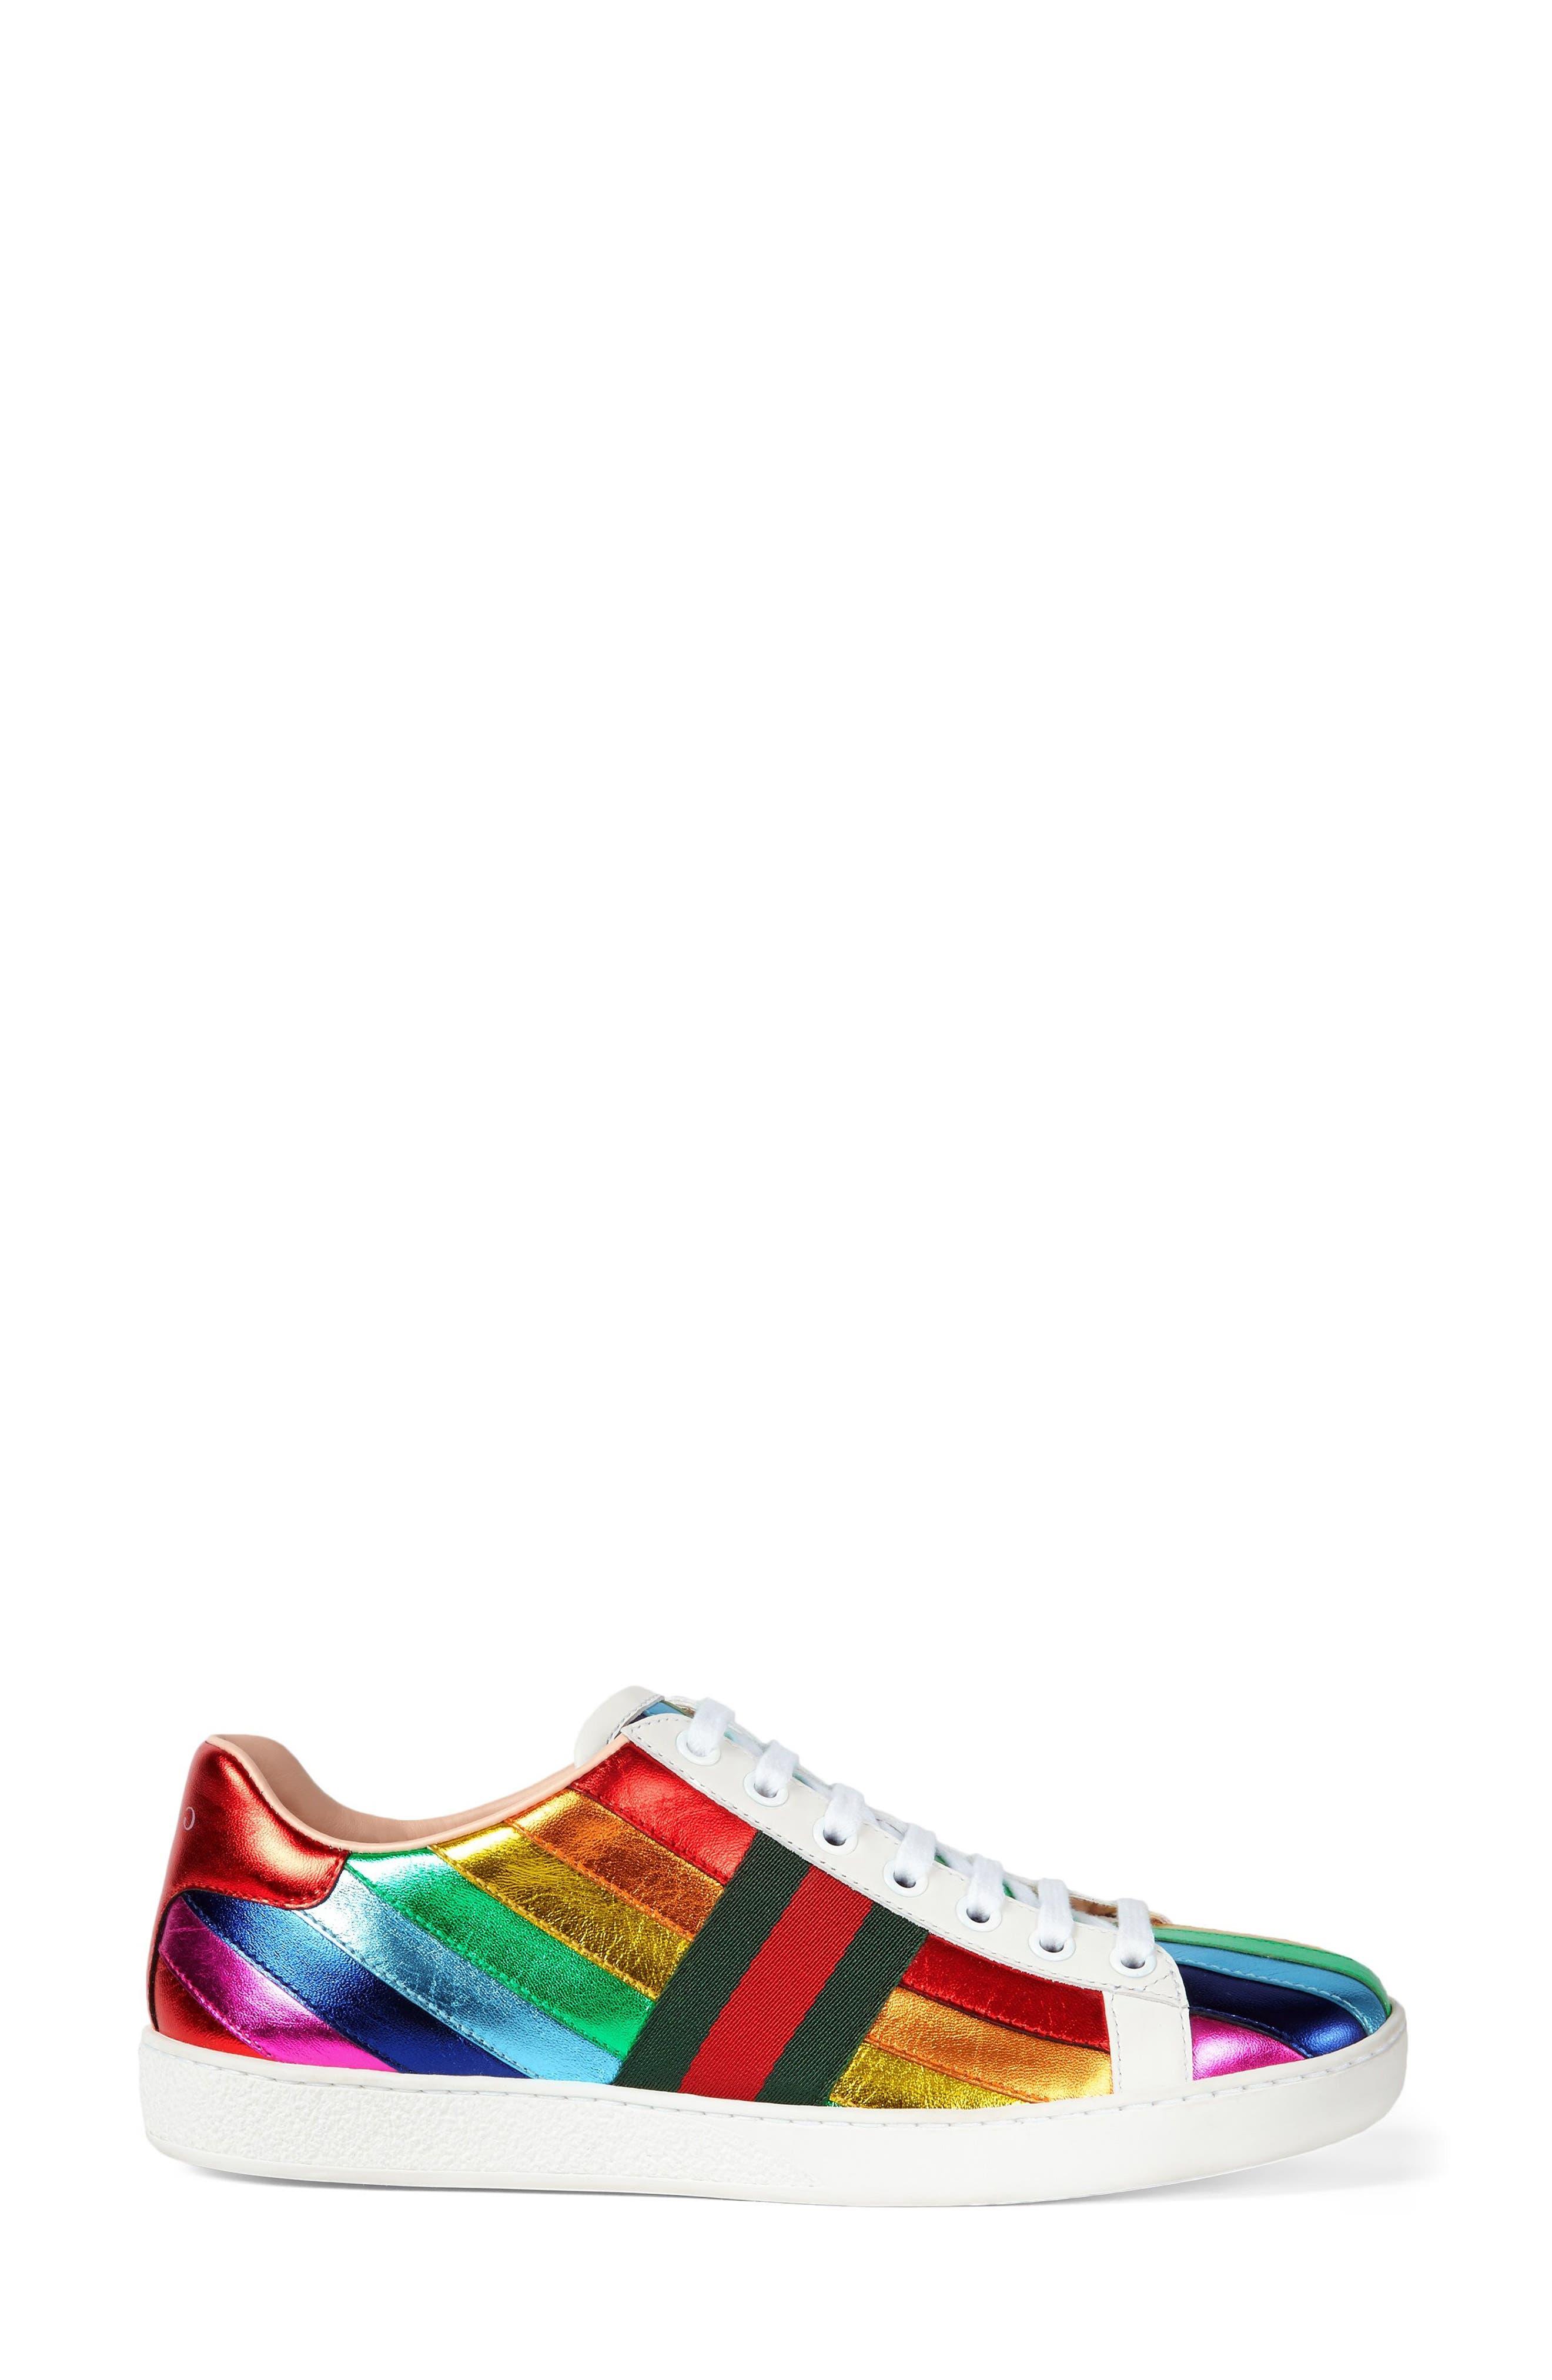 Main Image - Gucci New Ace Rainbow Sneaker (Women)